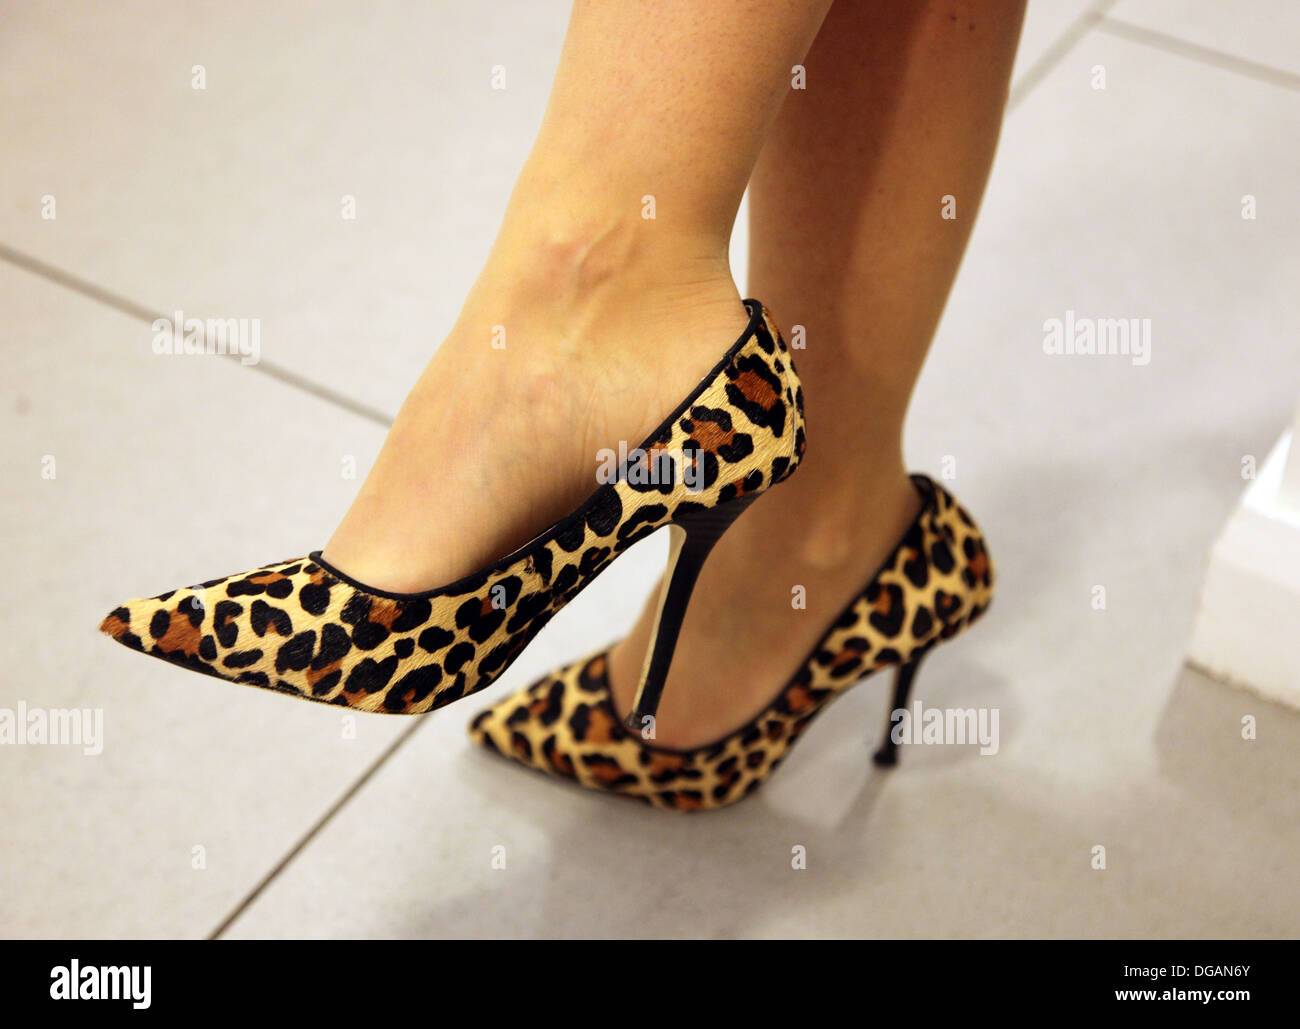 Zapatos Foto De Stiletto Imitación Leopardo Piel Tacón PNwn0XO8kZ